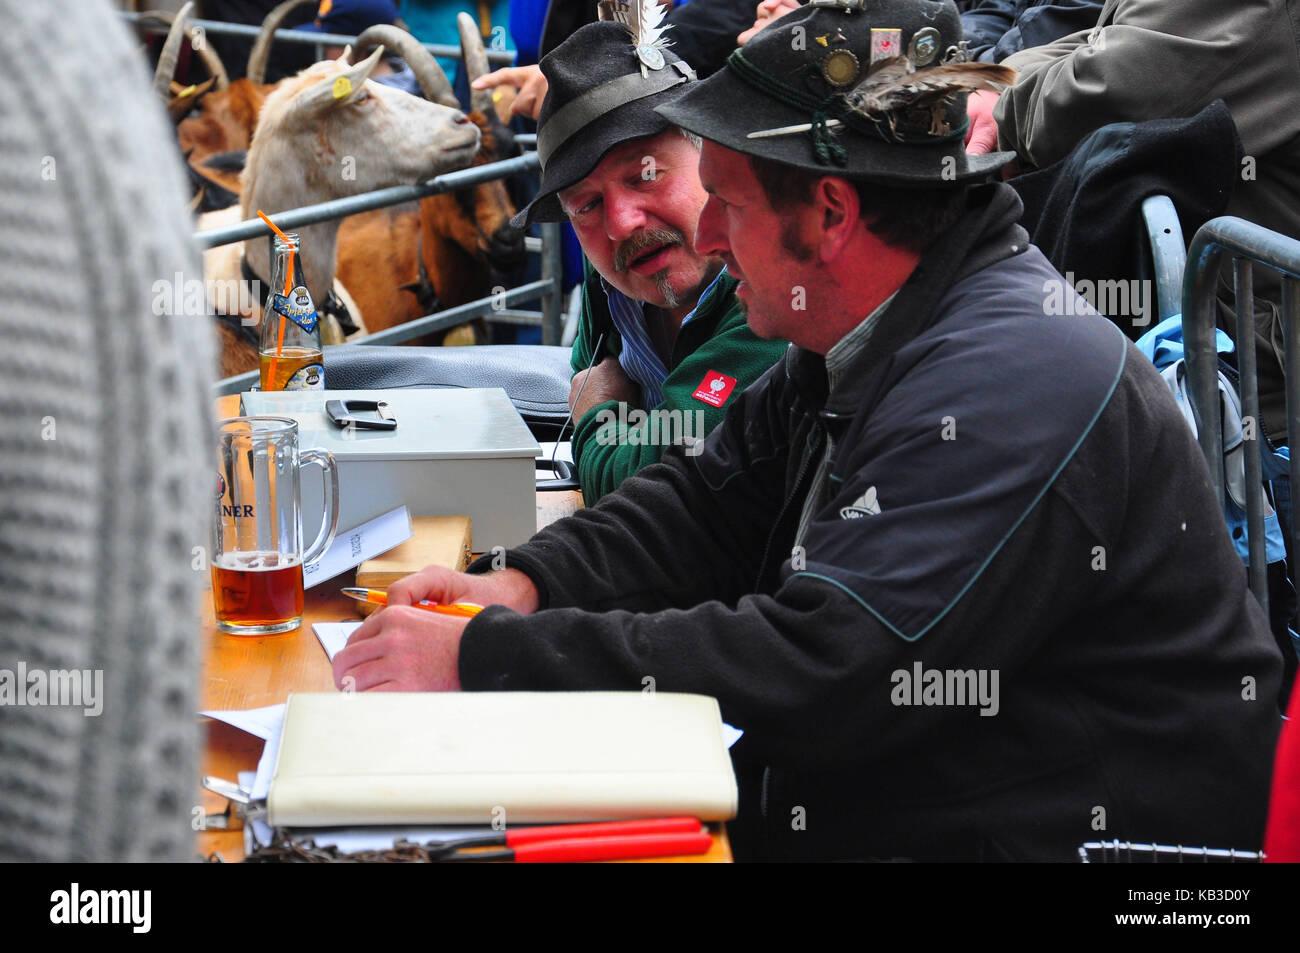 Germany, Bavaria, Isar valley, Mittenwald, Ziegenabtrieb, evaluation judge, - Stock Image